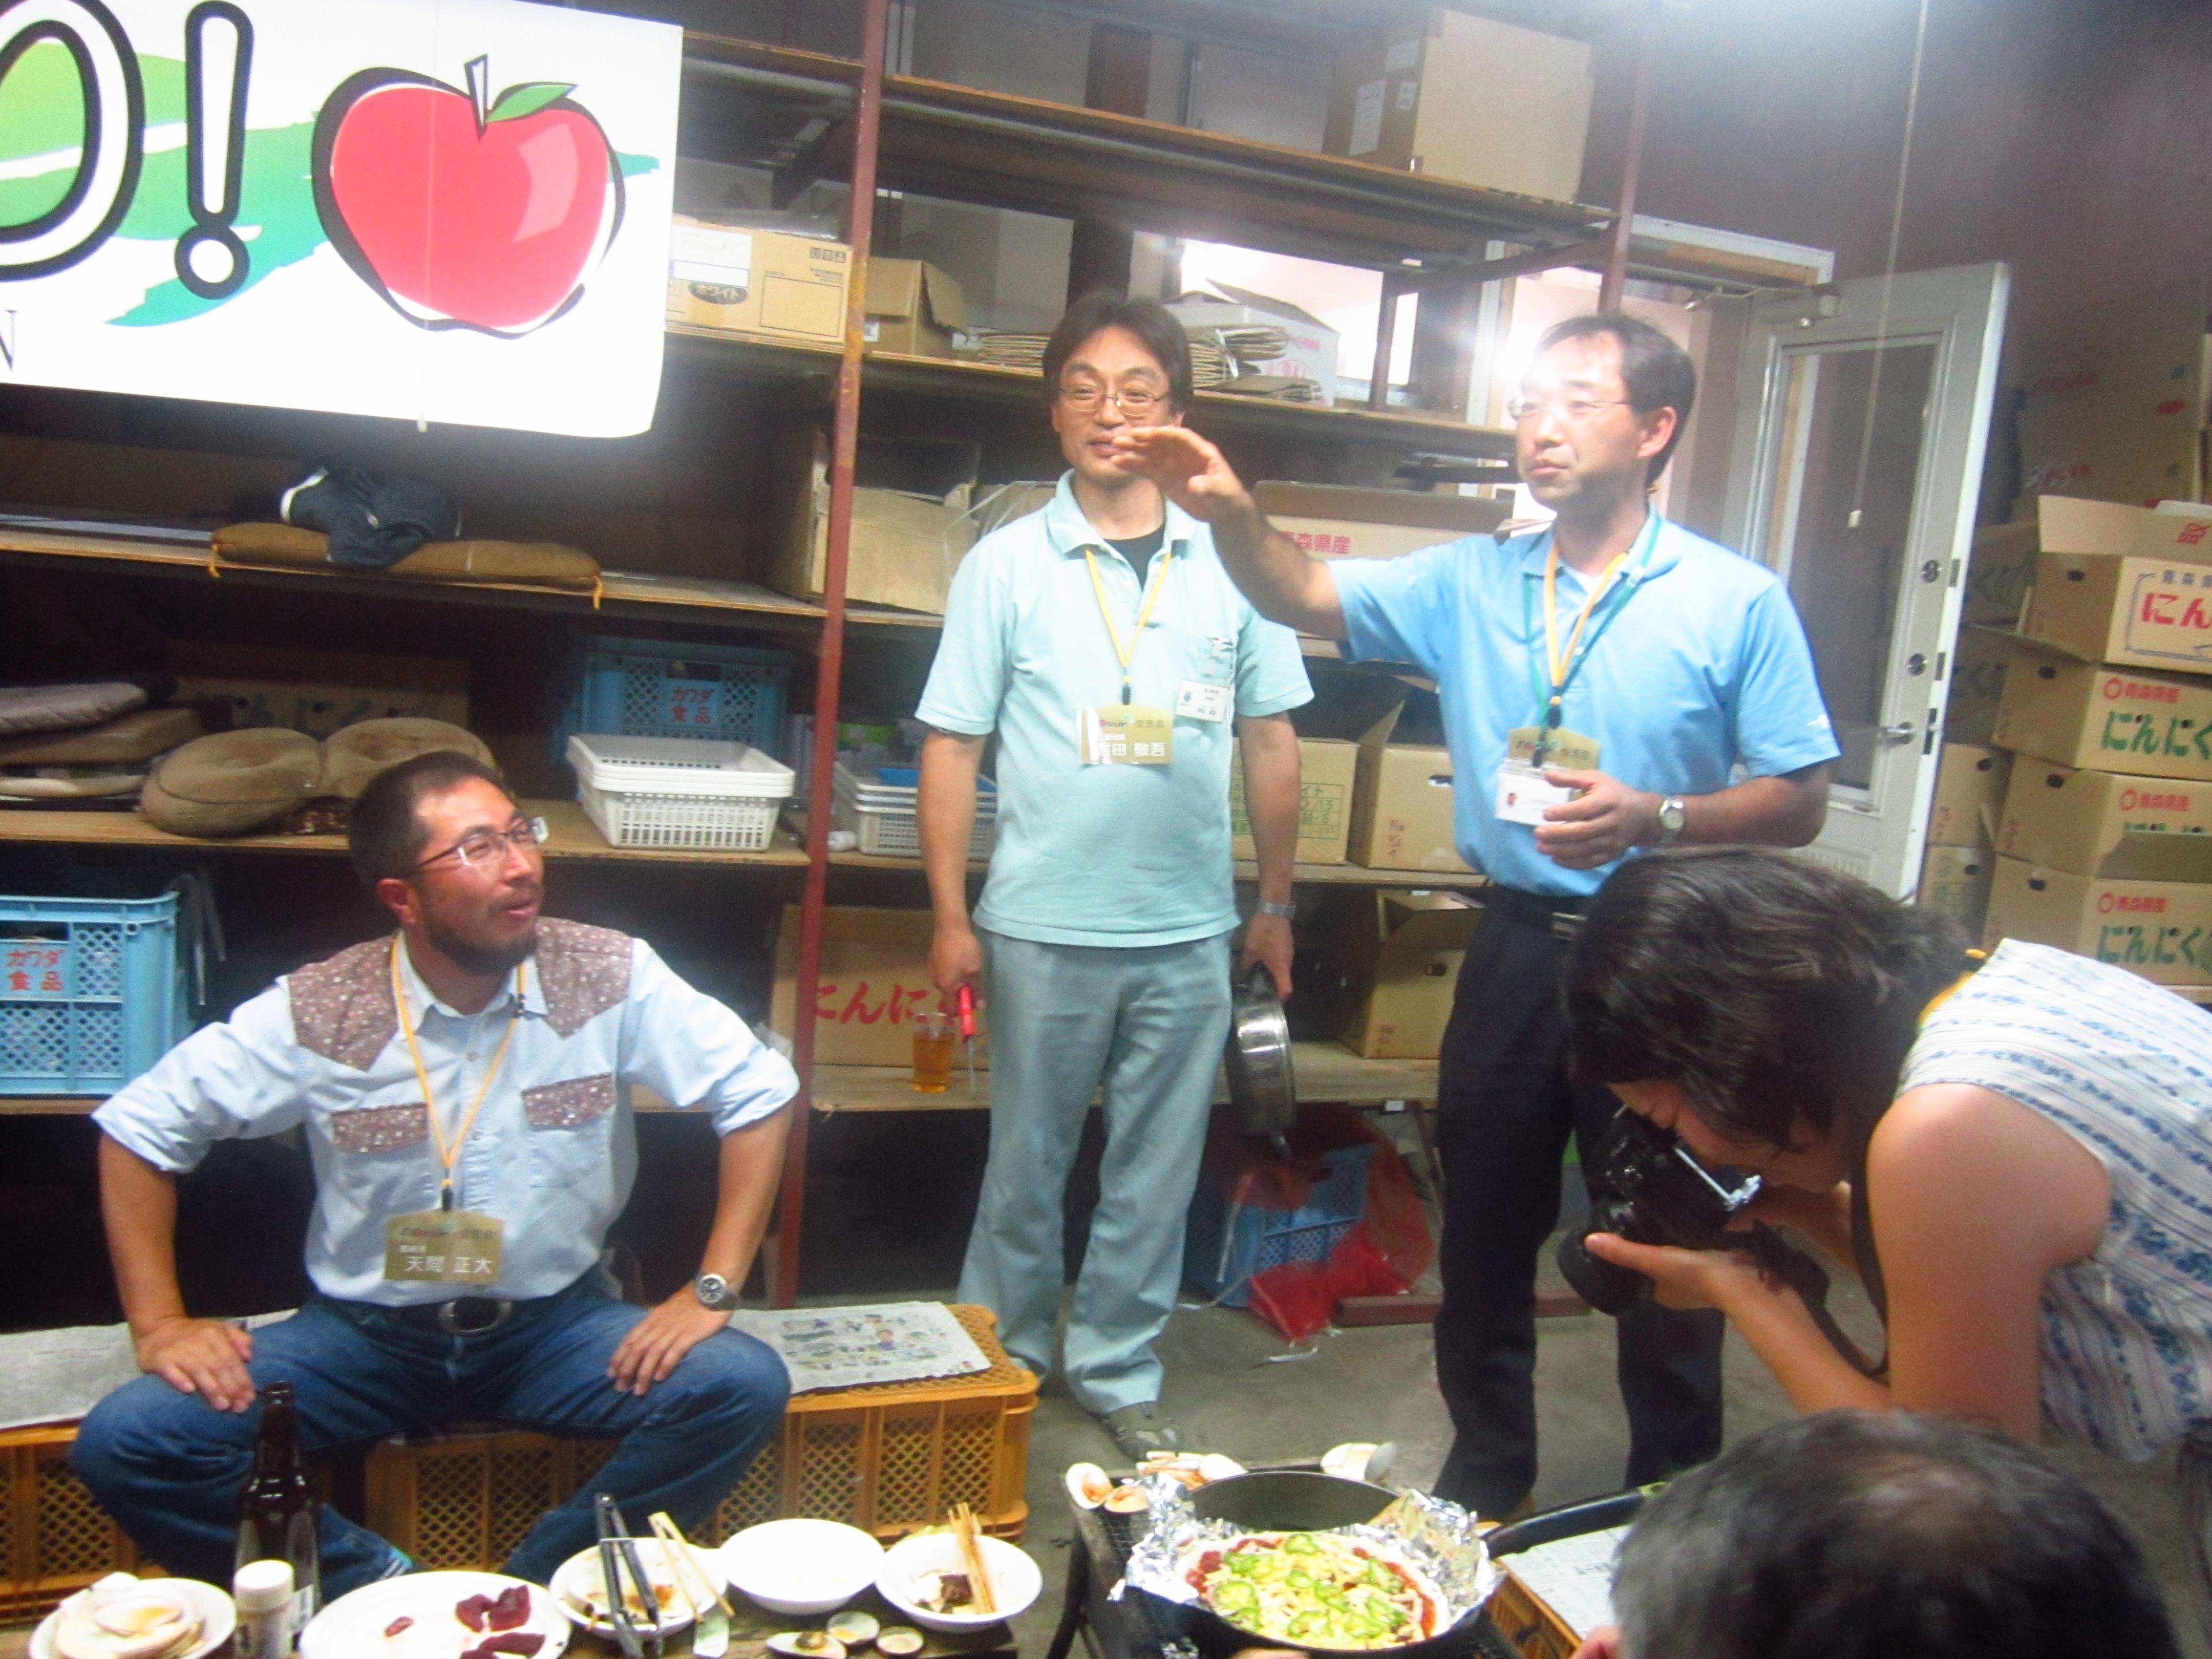 IMG 4429 - 麻布十番納涼祭り25,26日(七戸町出店)